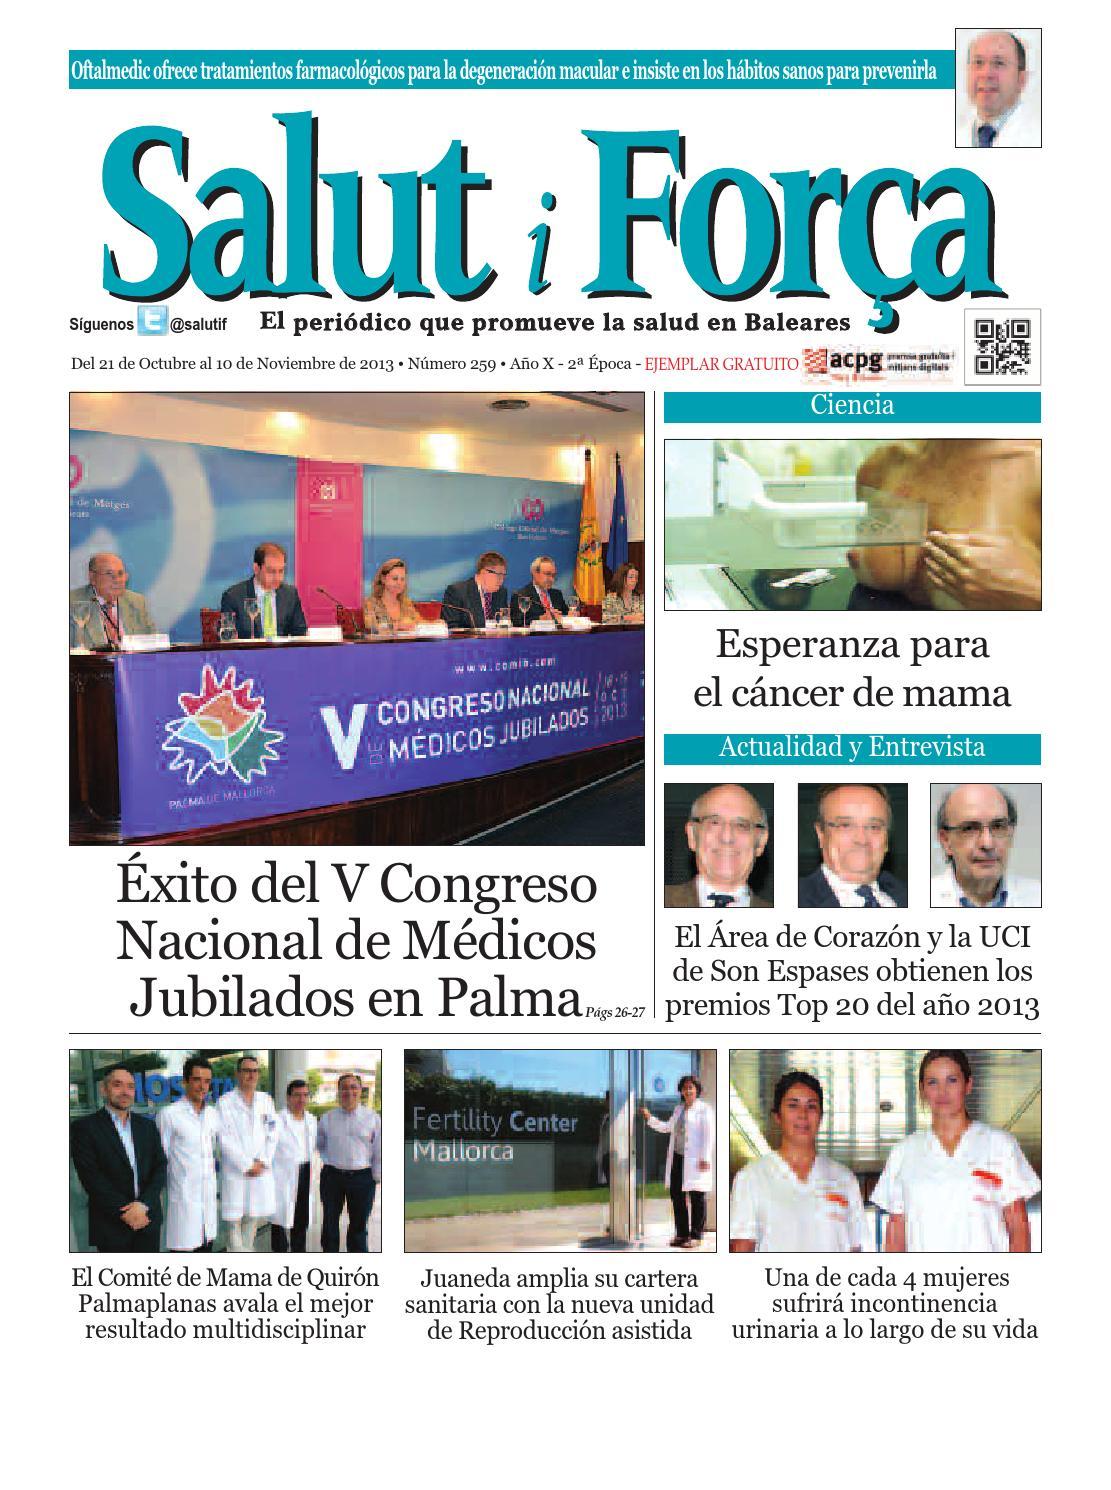 259 Salut i Forca Baleares by Salud Ediciones - issuu